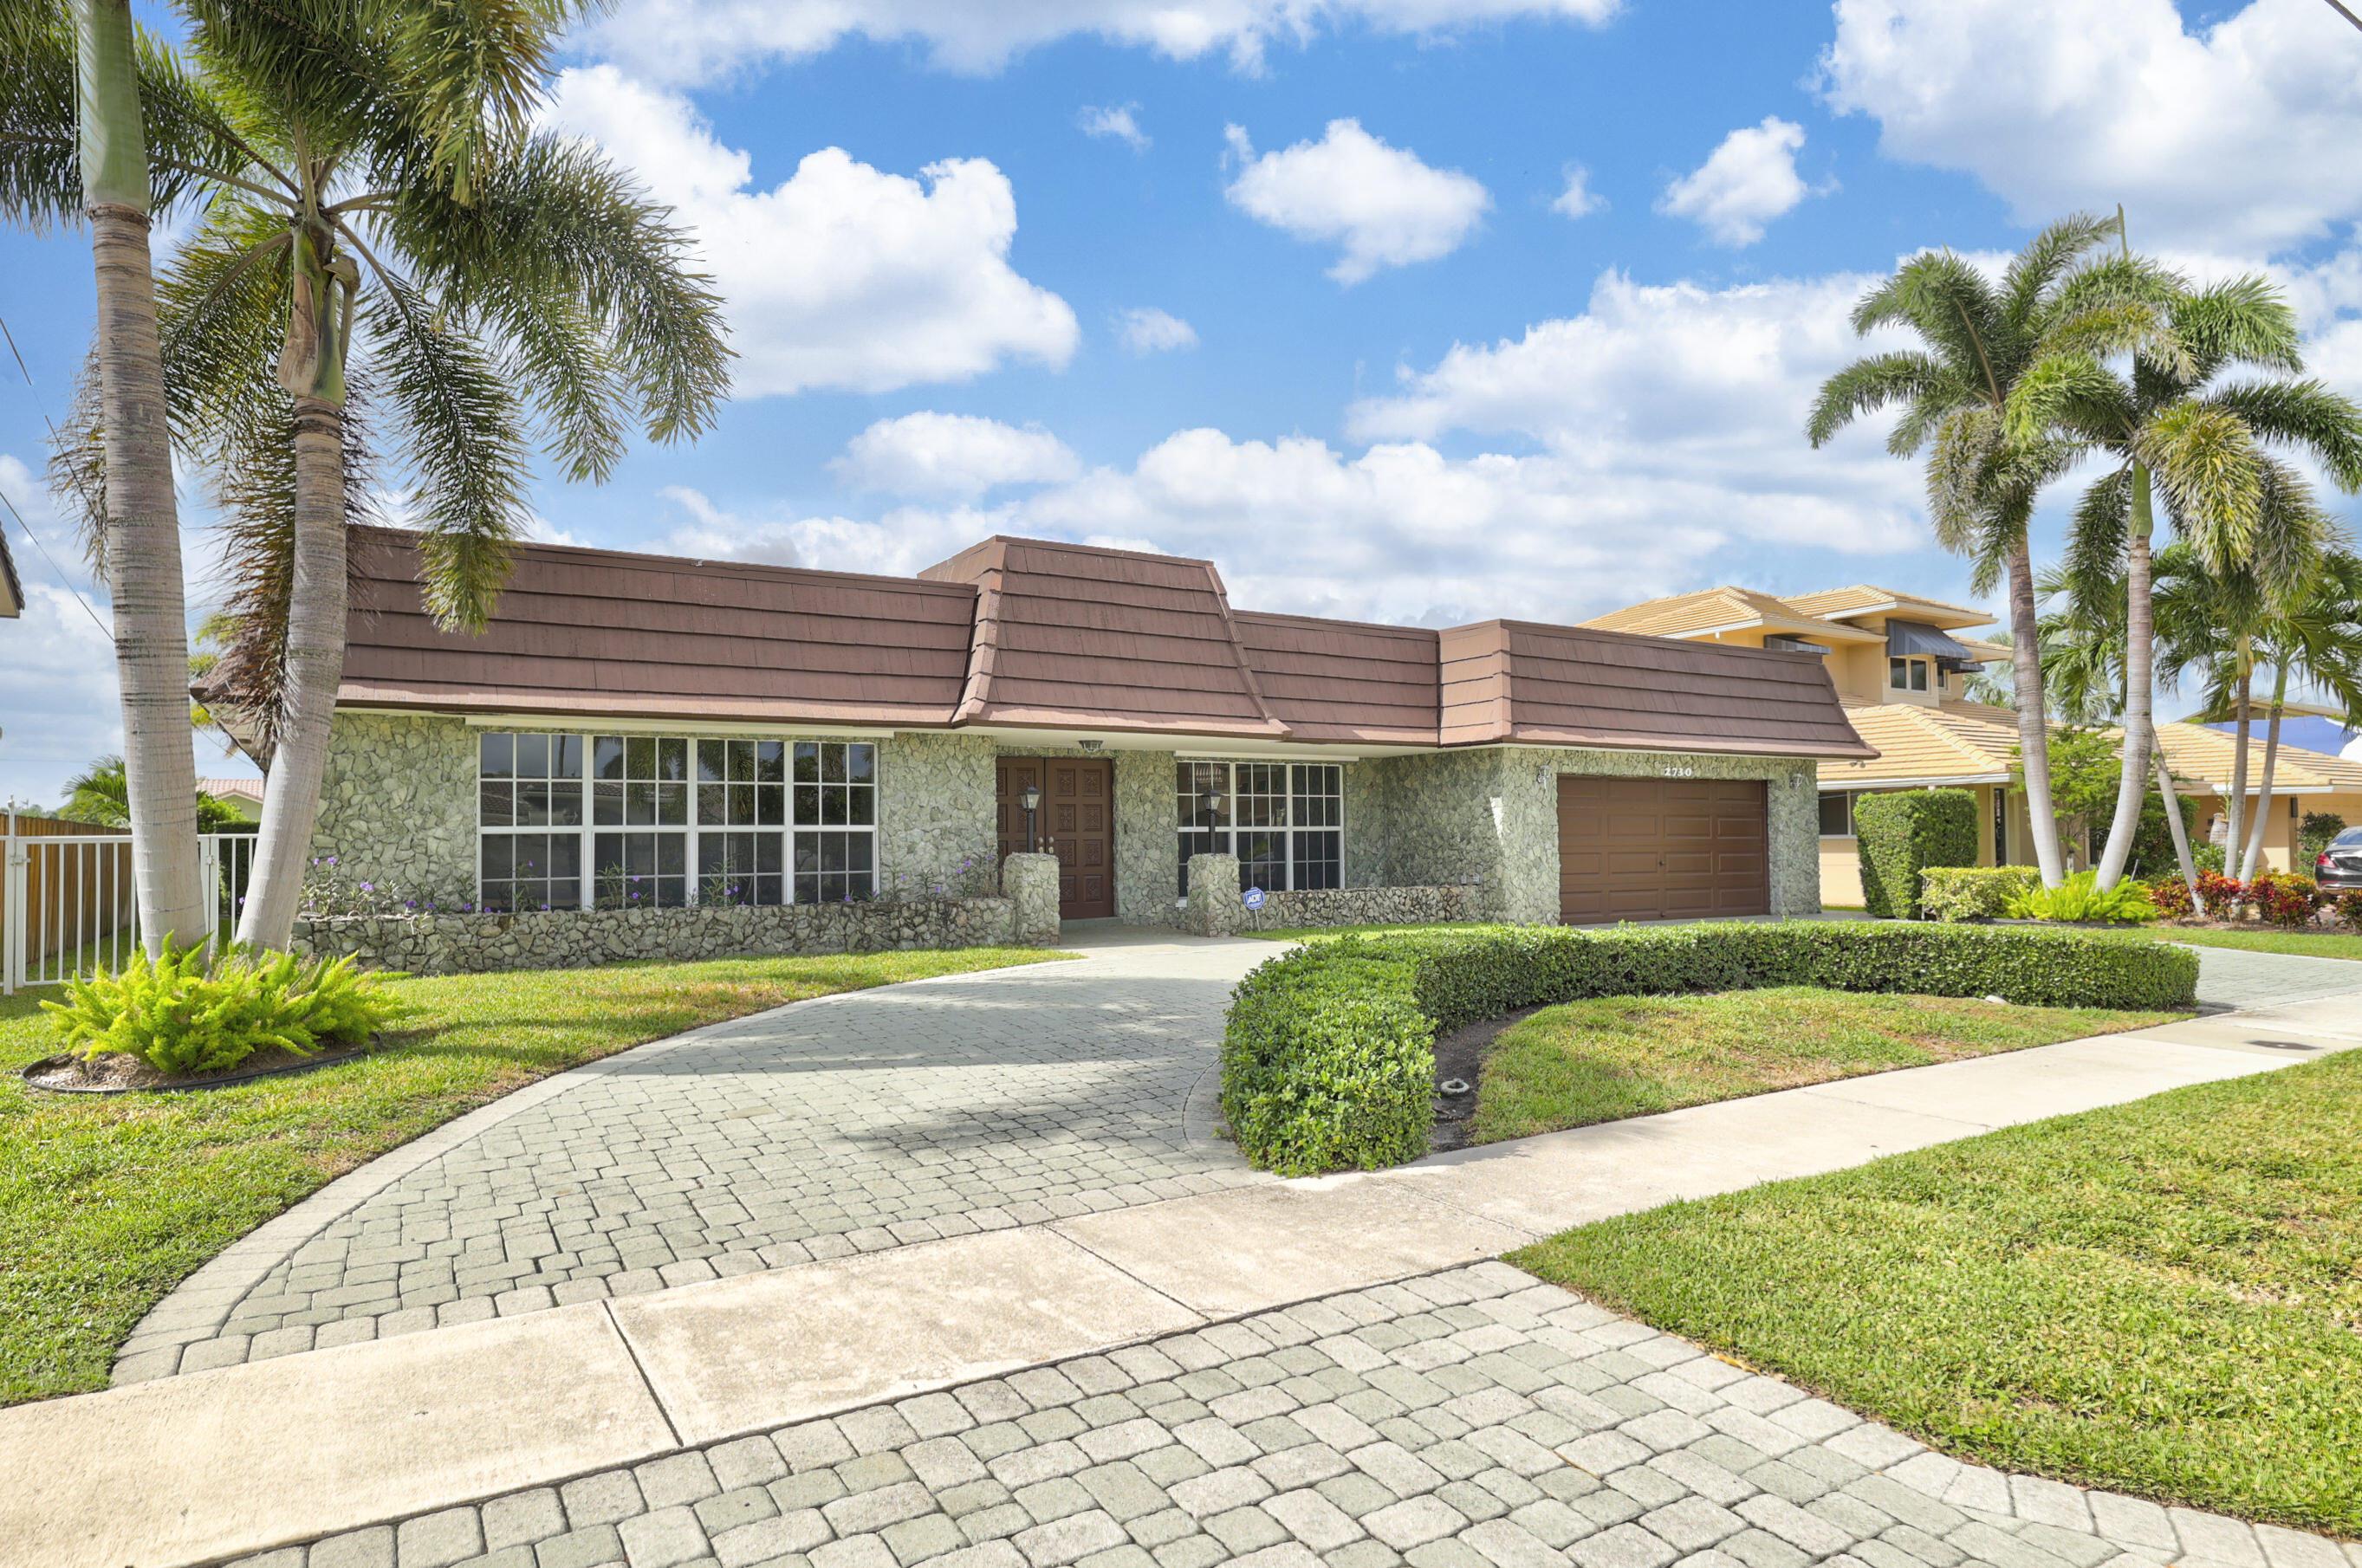 2730 NE 47 Street  For Sale 10743432, FL